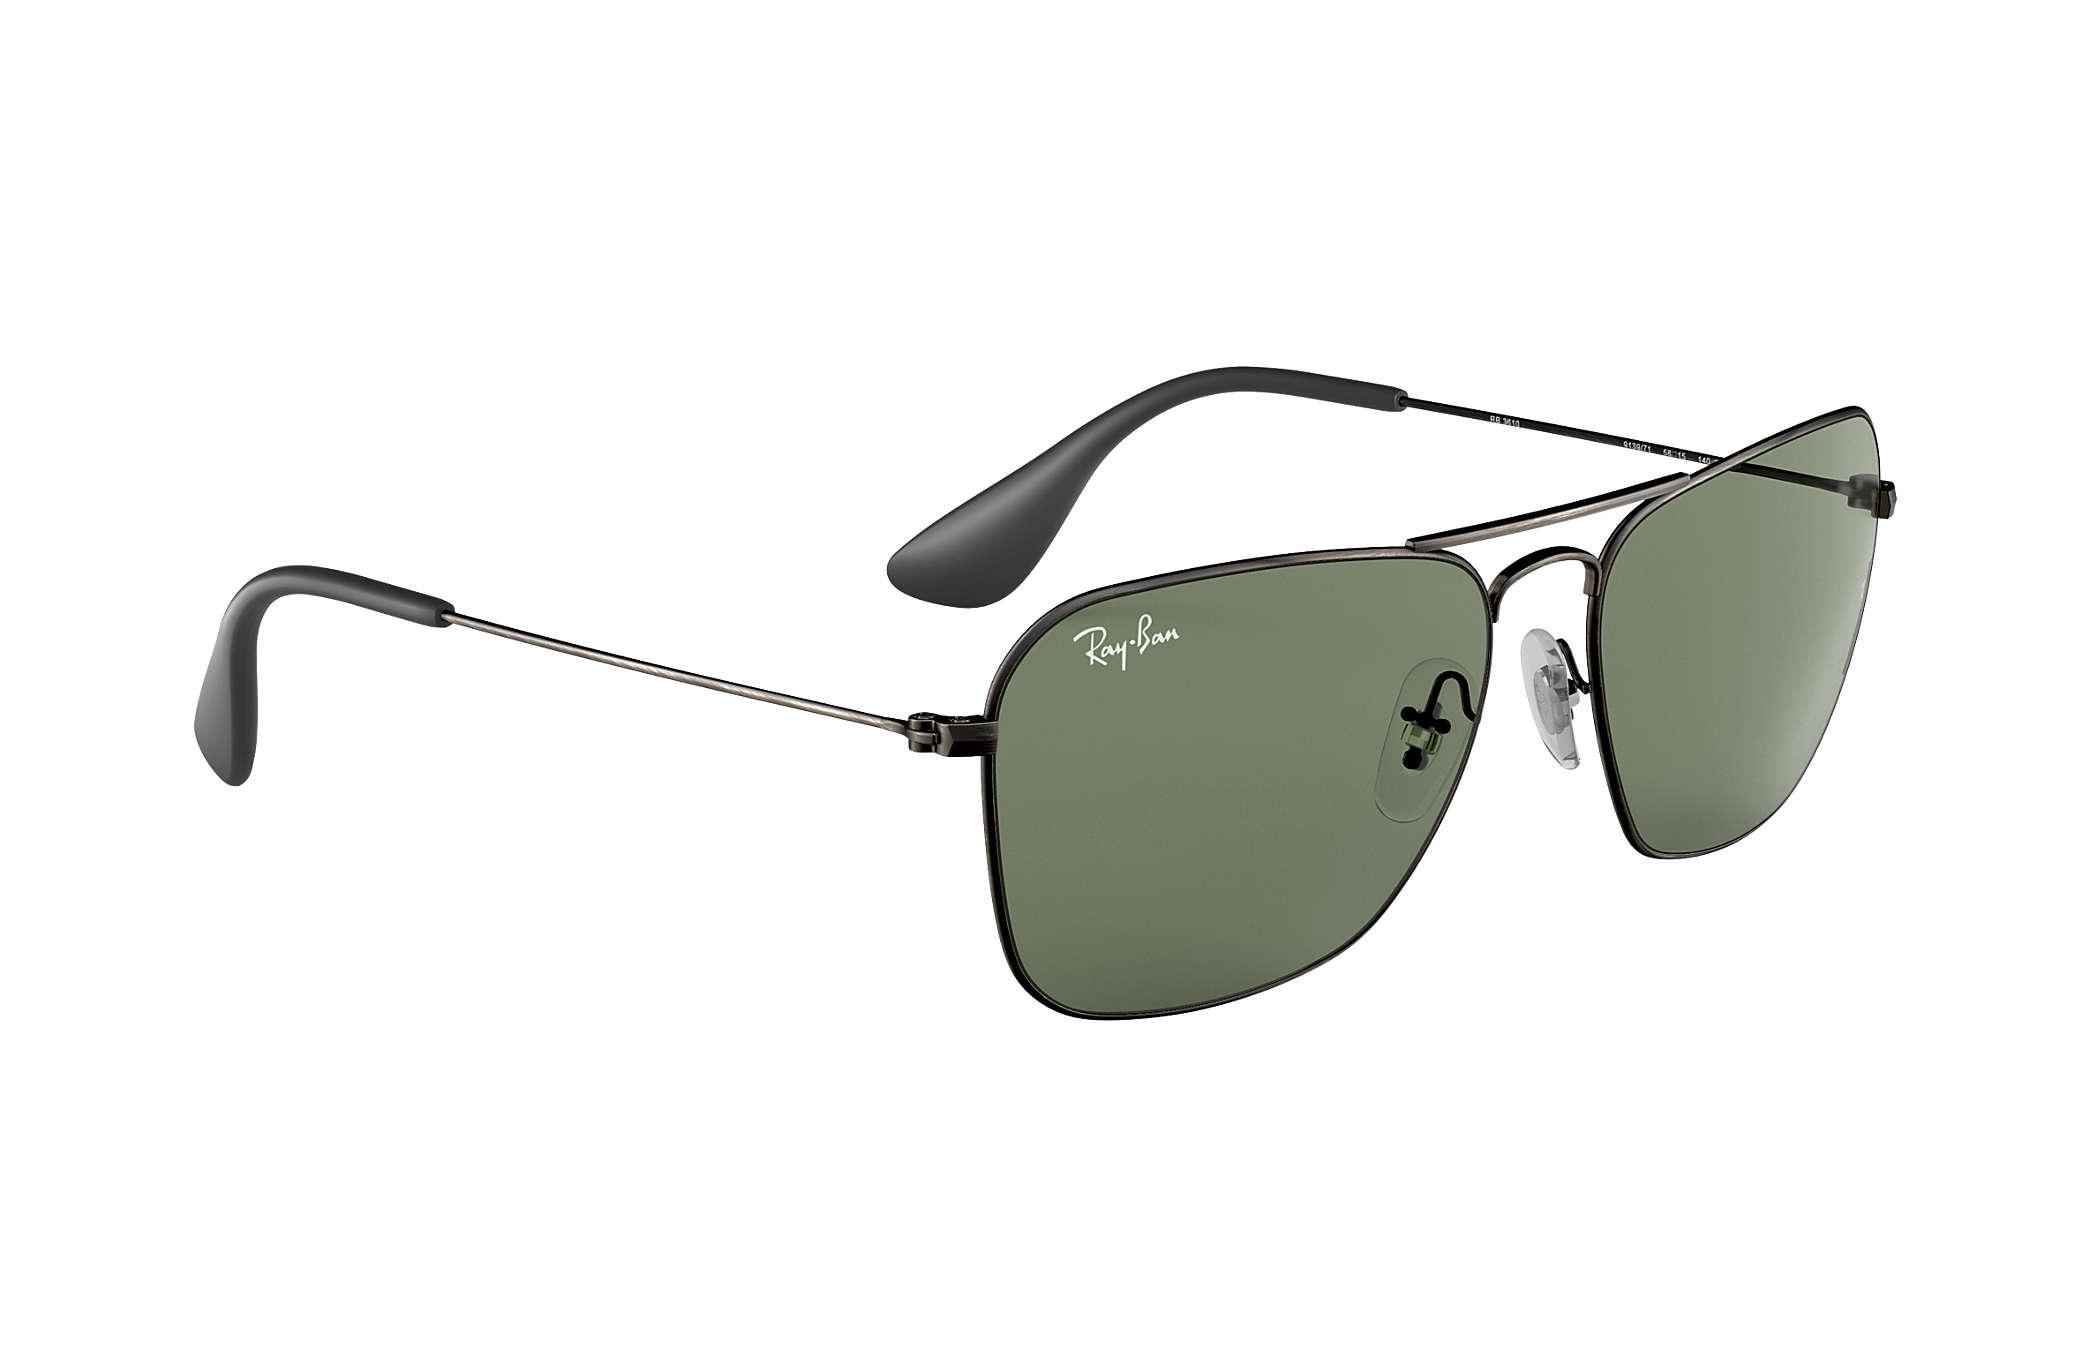 e0c3d4c8bf7 Ray-Ban RB3610 Black - Metal - Green Lenses - 0RB361091397158